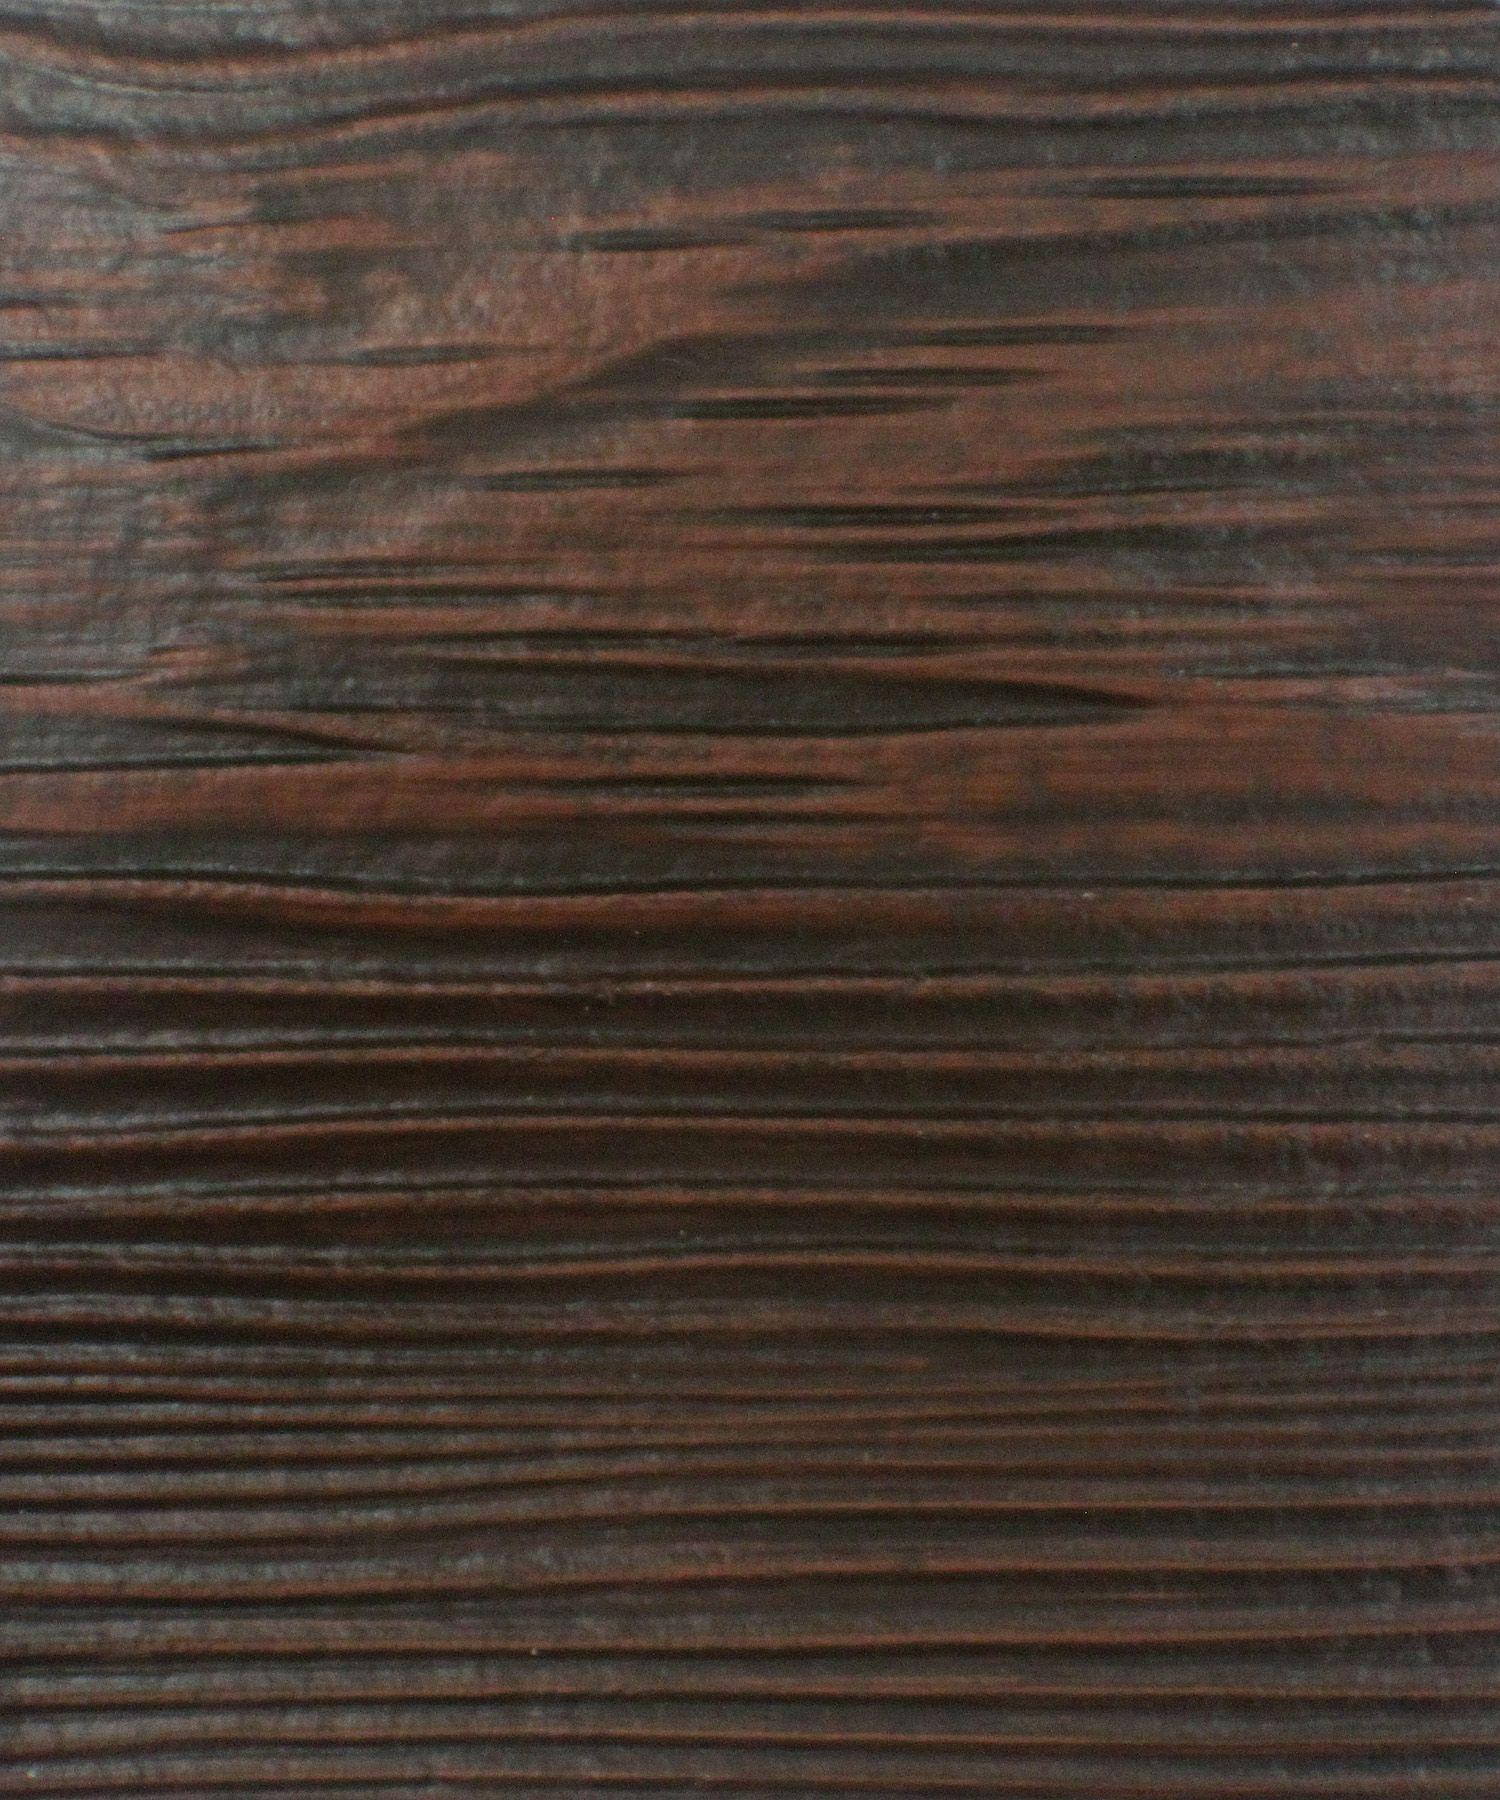 Warm Espresso RusticSeries Two-toned Siding That Looks Like Wood | Wood  vinyl siding, Wood siding exterior, Wood siding house